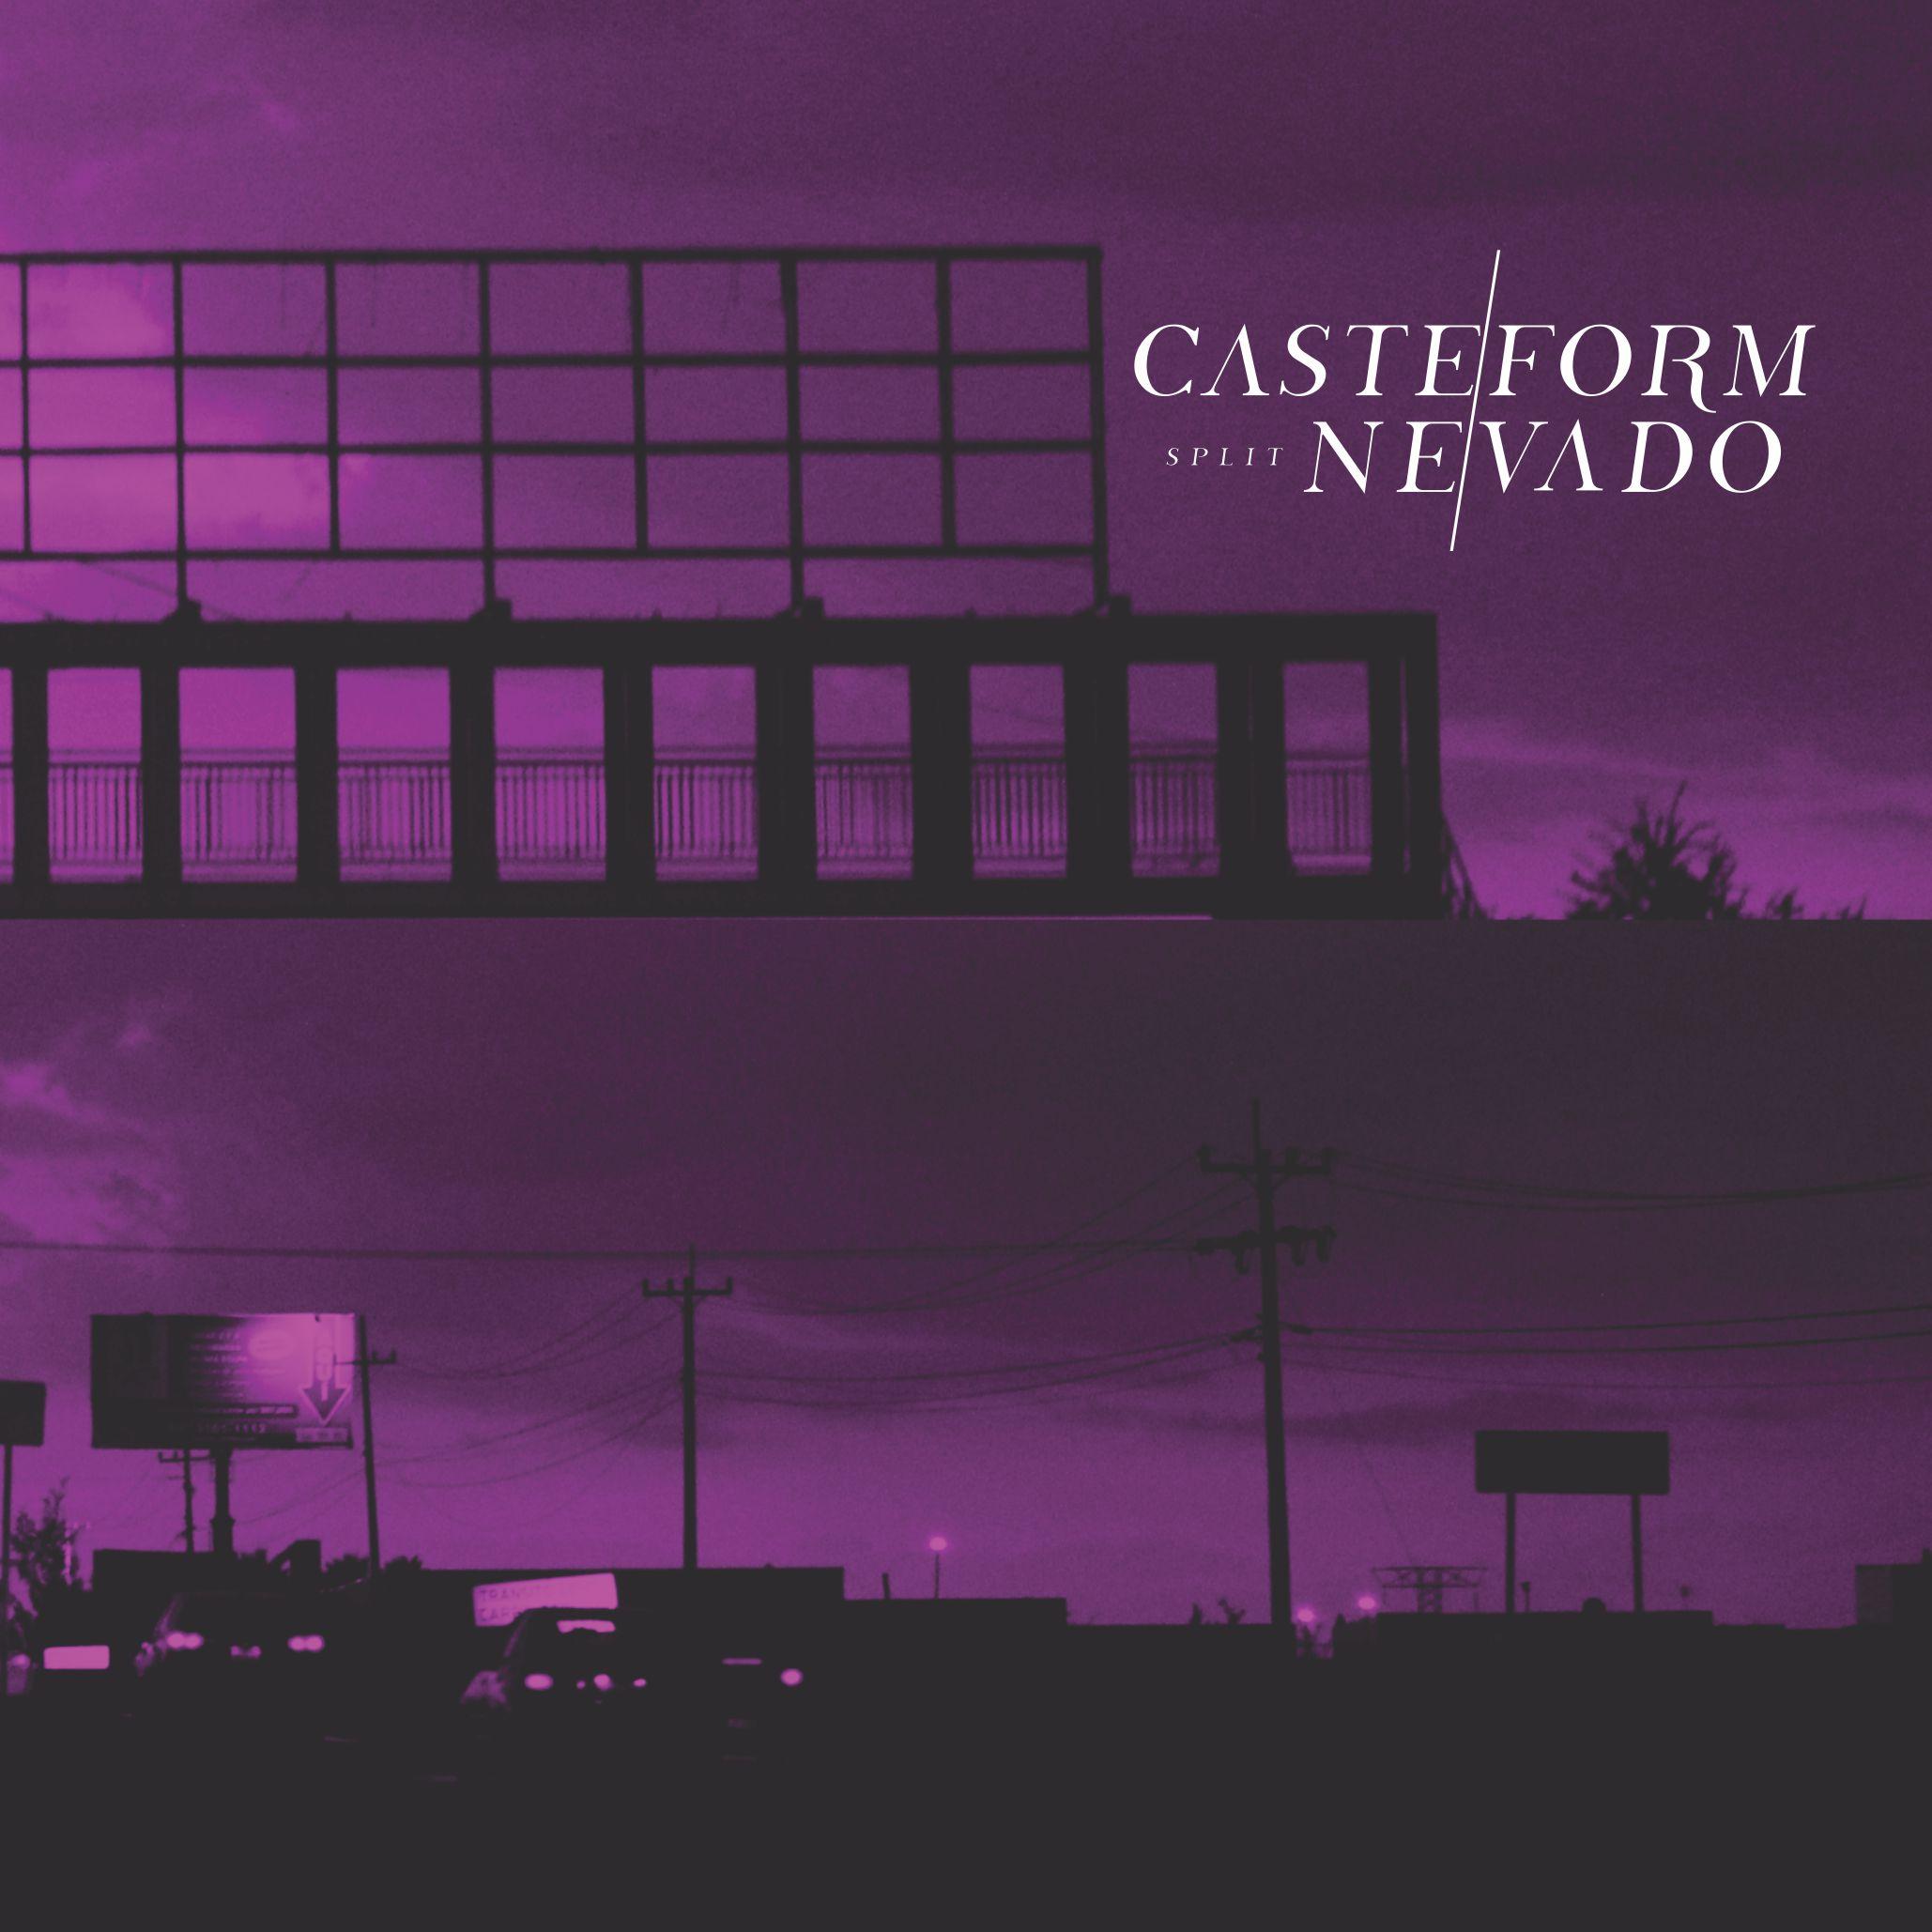 Casteform/Nevado Split (Cassette/CD)